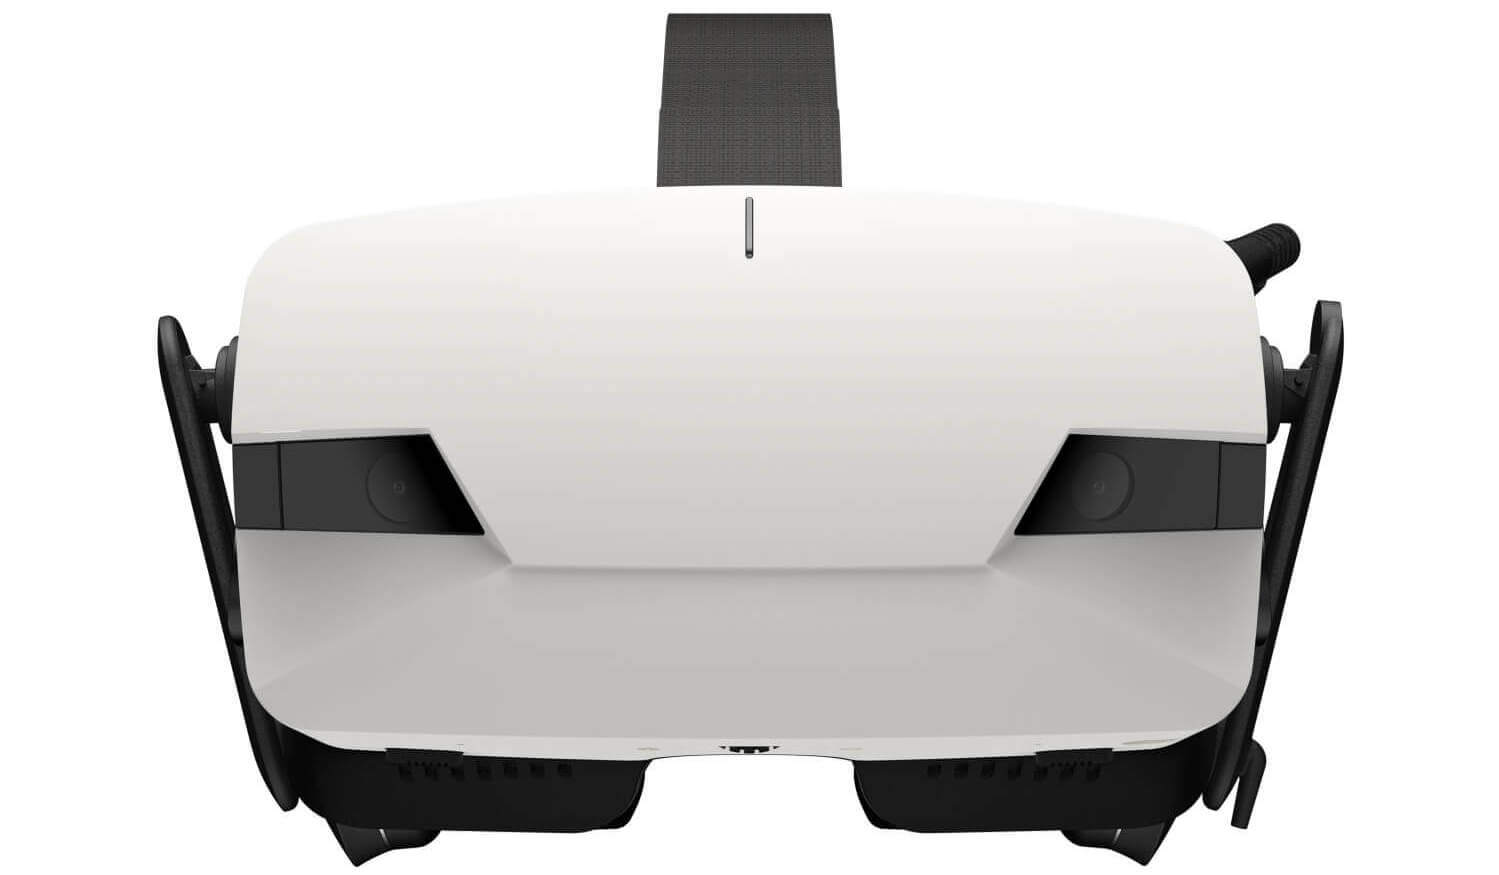 Acer ConceptD OJO AH701P